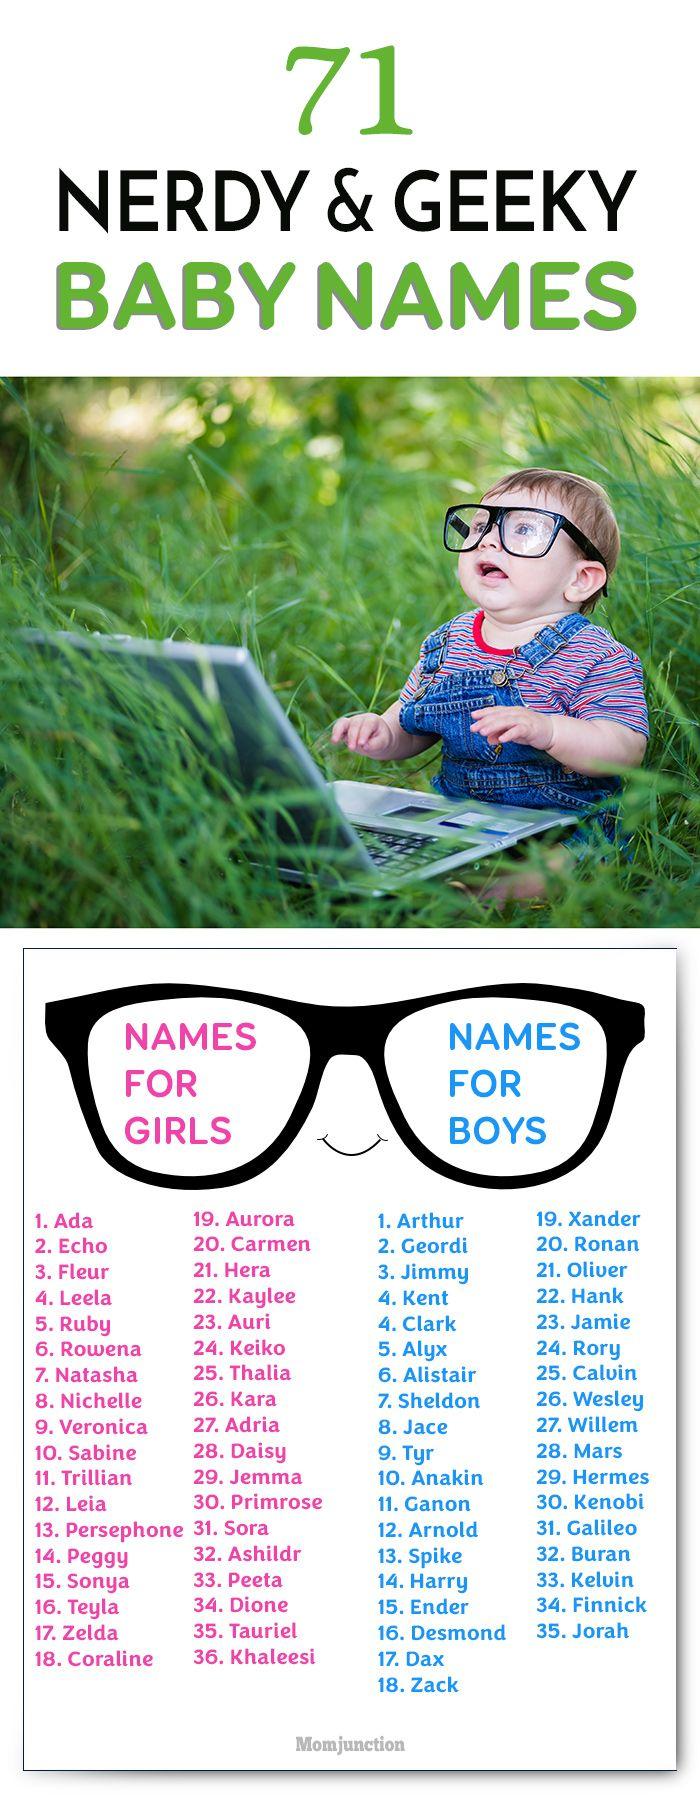 Nerdy nicknames for girls